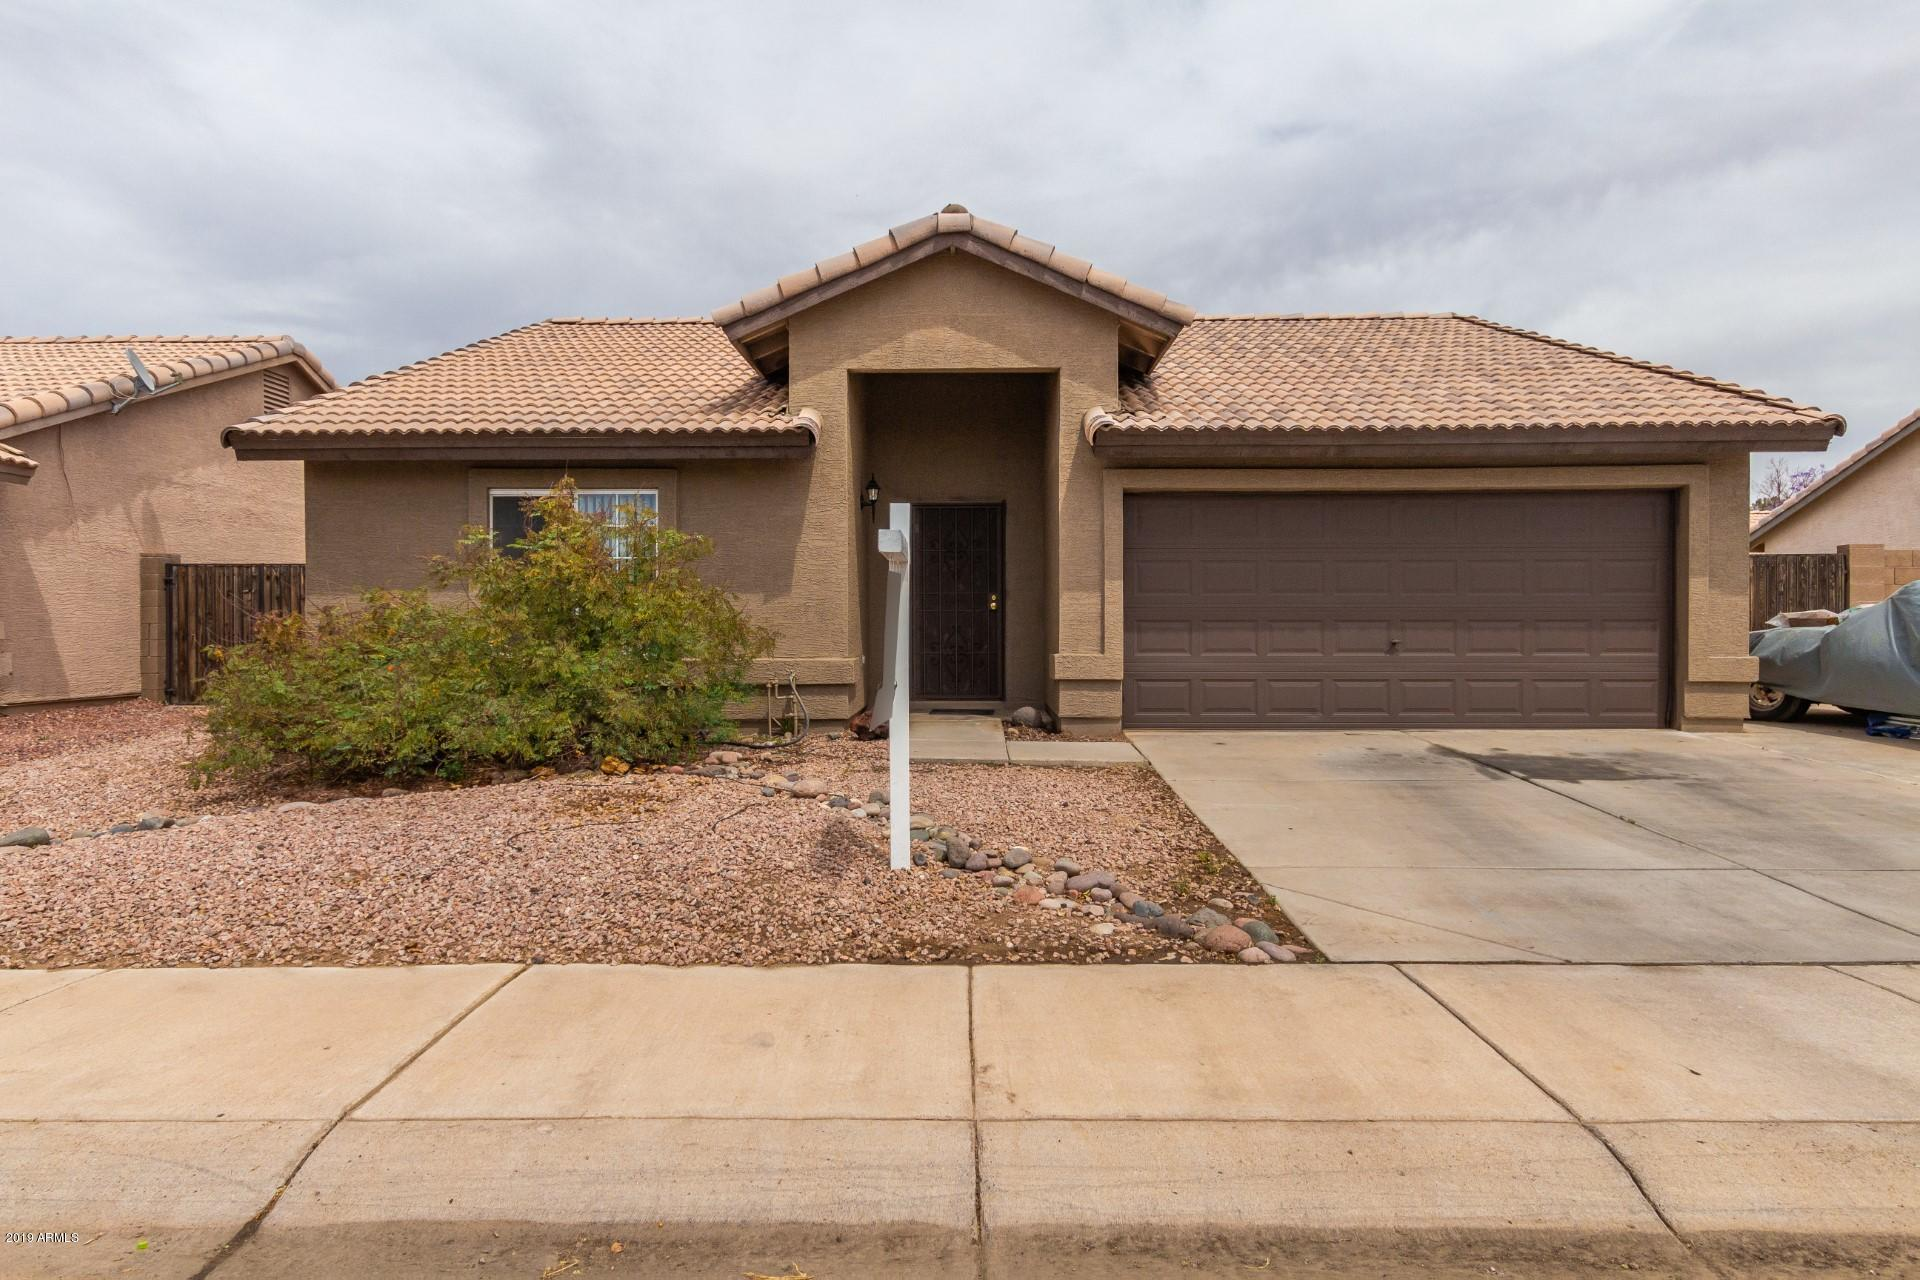 Photo of 1193 S ANVIL Place, Chandler, AZ 85286